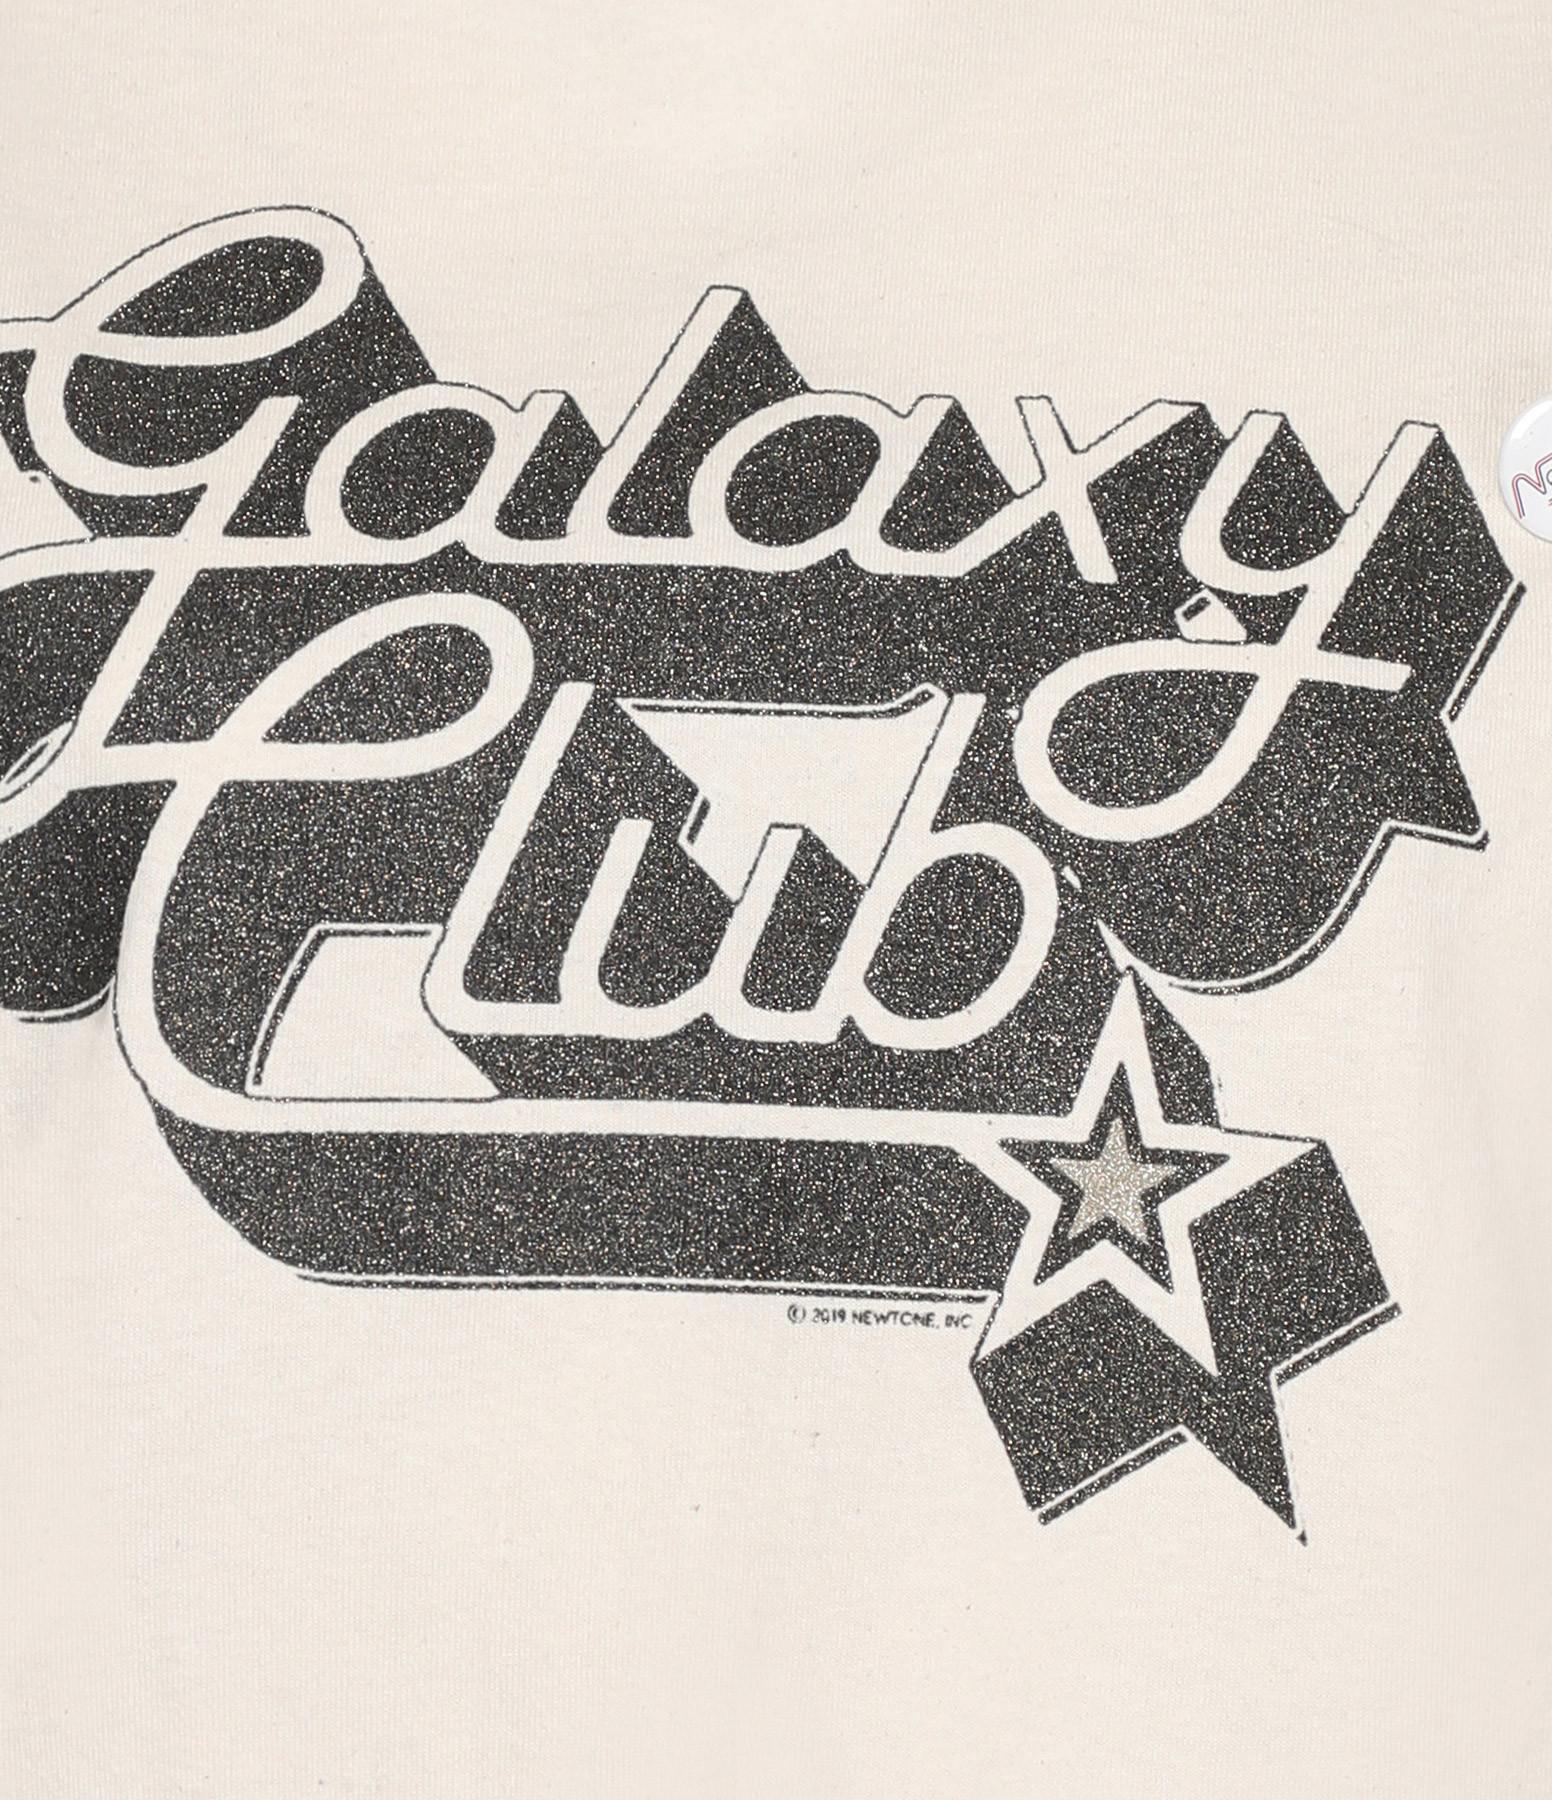 NEWTONE - Tee-shirt Galaxy Club Naturel Edition Limitée Glitters